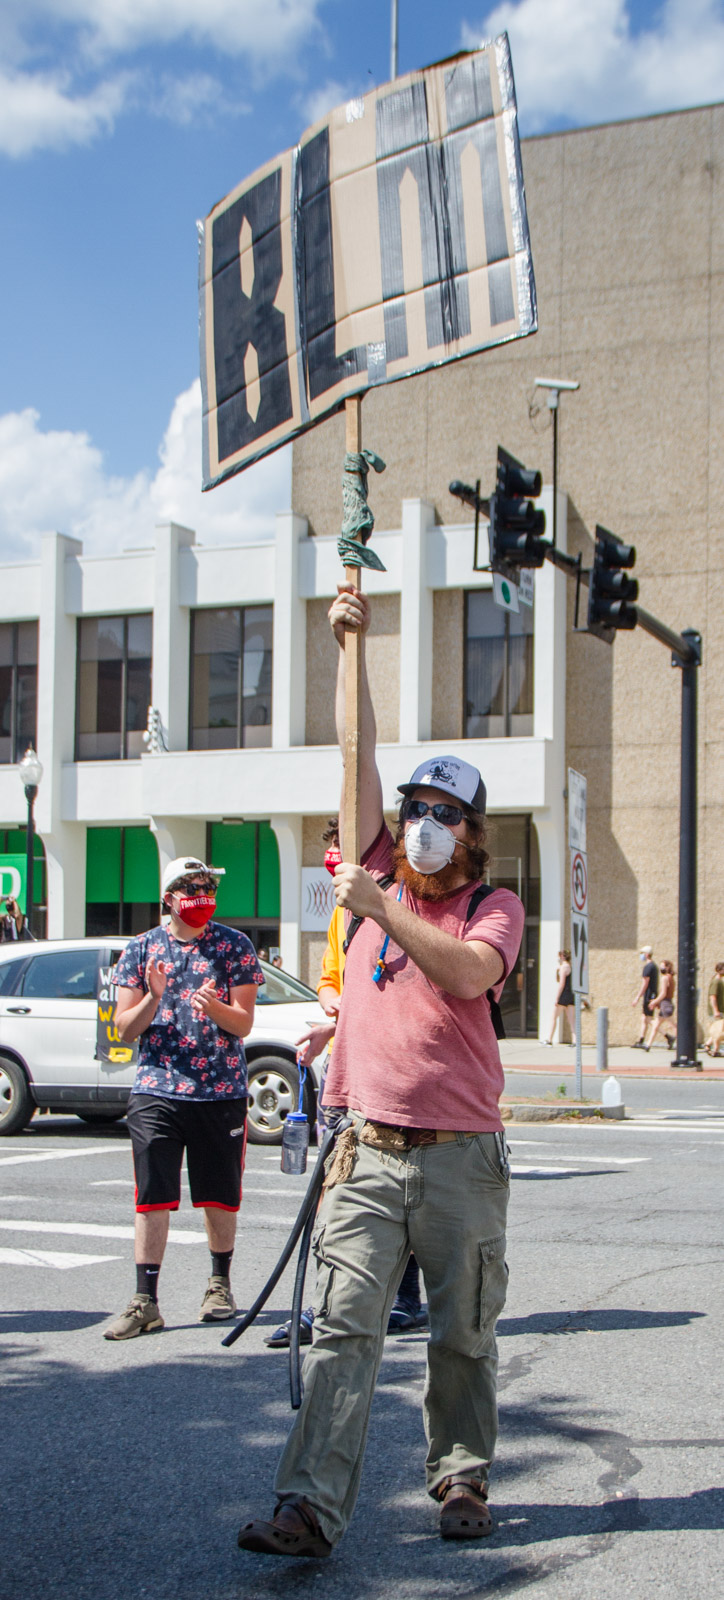 Black Lives Matter protest in Greenfield MA, Sat June 6, 2020